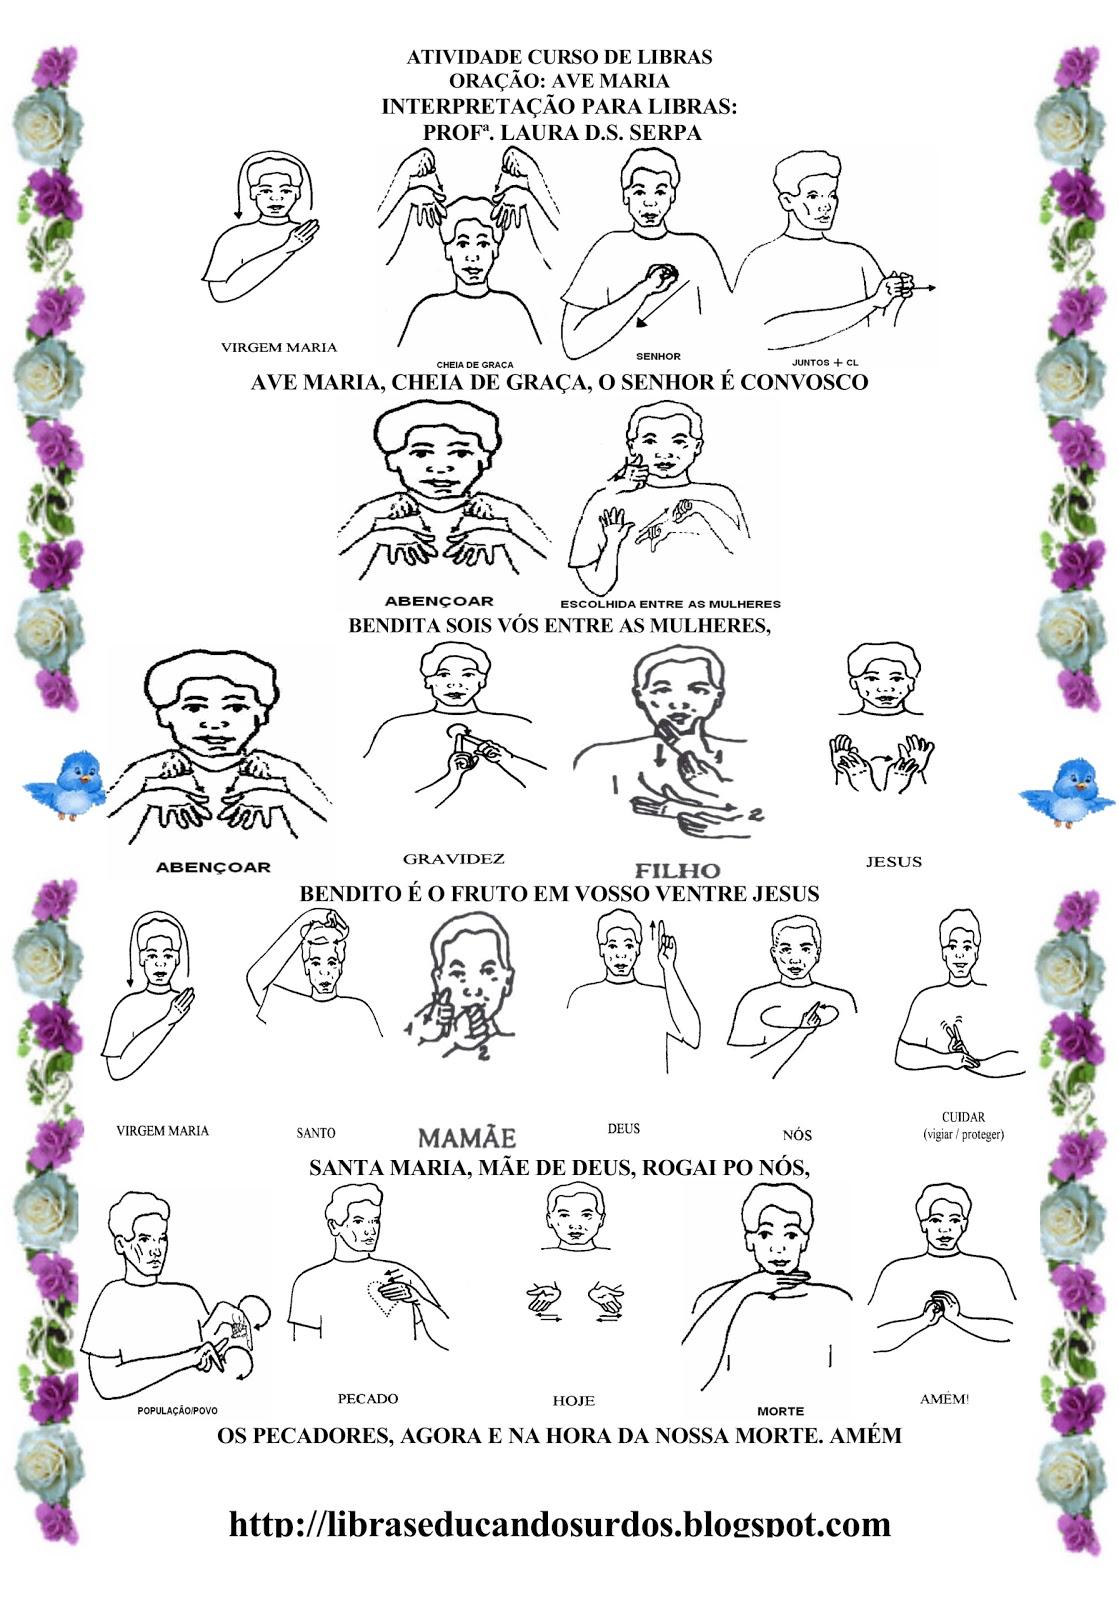 LIBRAS: Educandos Surdos: Ave maria em LIBRAS #466725 1119 1600